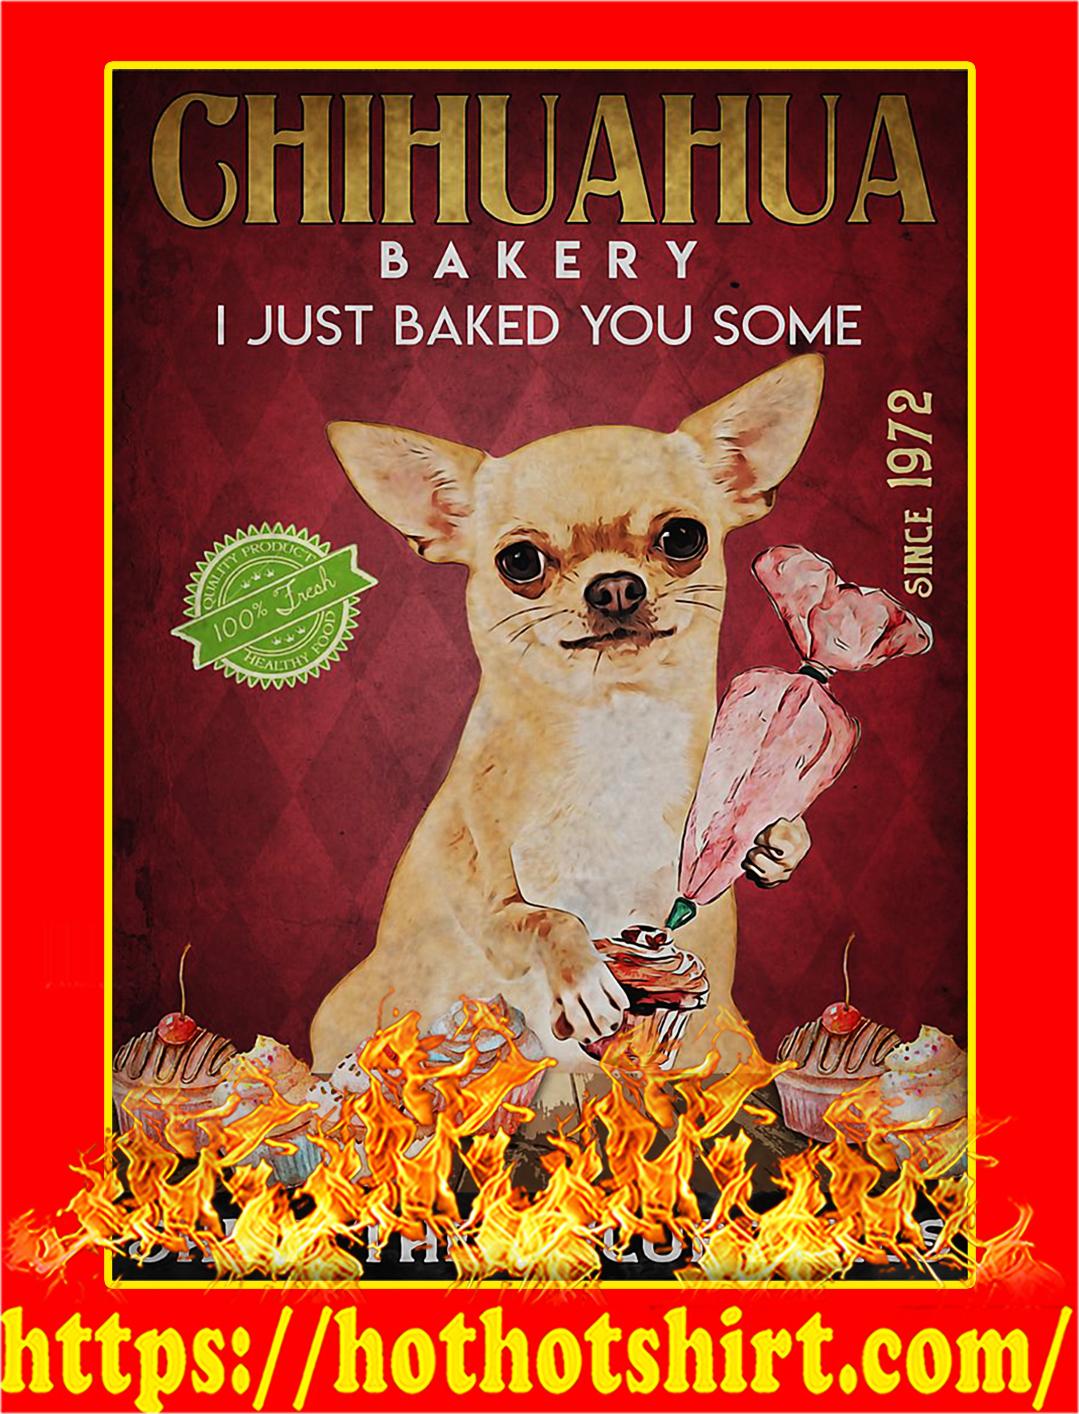 Chihuahua bakery shut the fucupcakes poster - A2